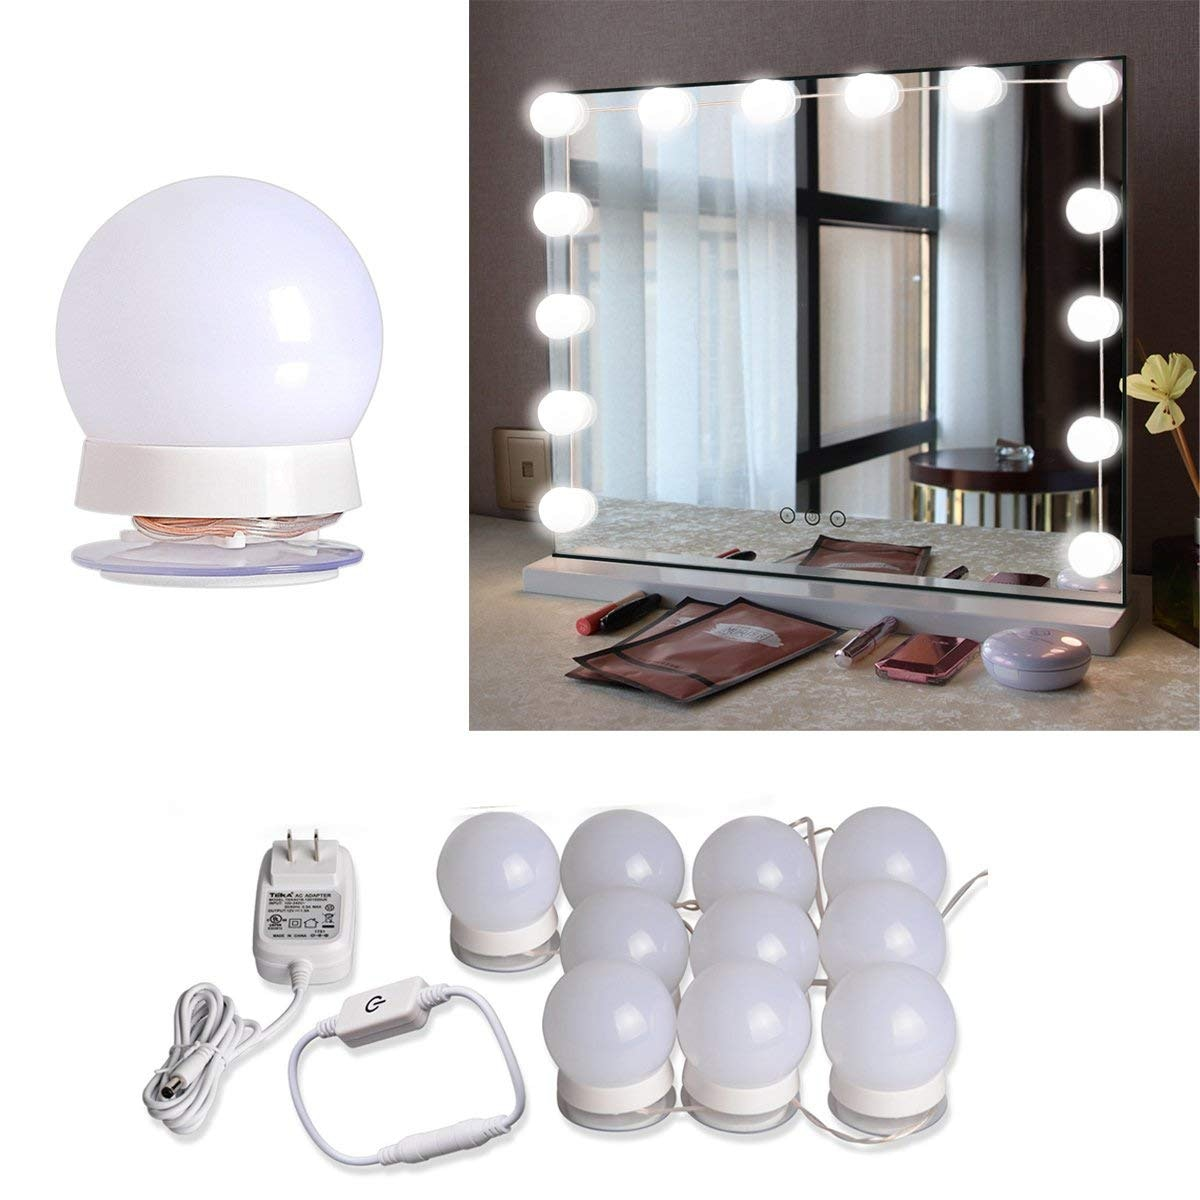 Brightown LED Vanity Mirror Lights Kit